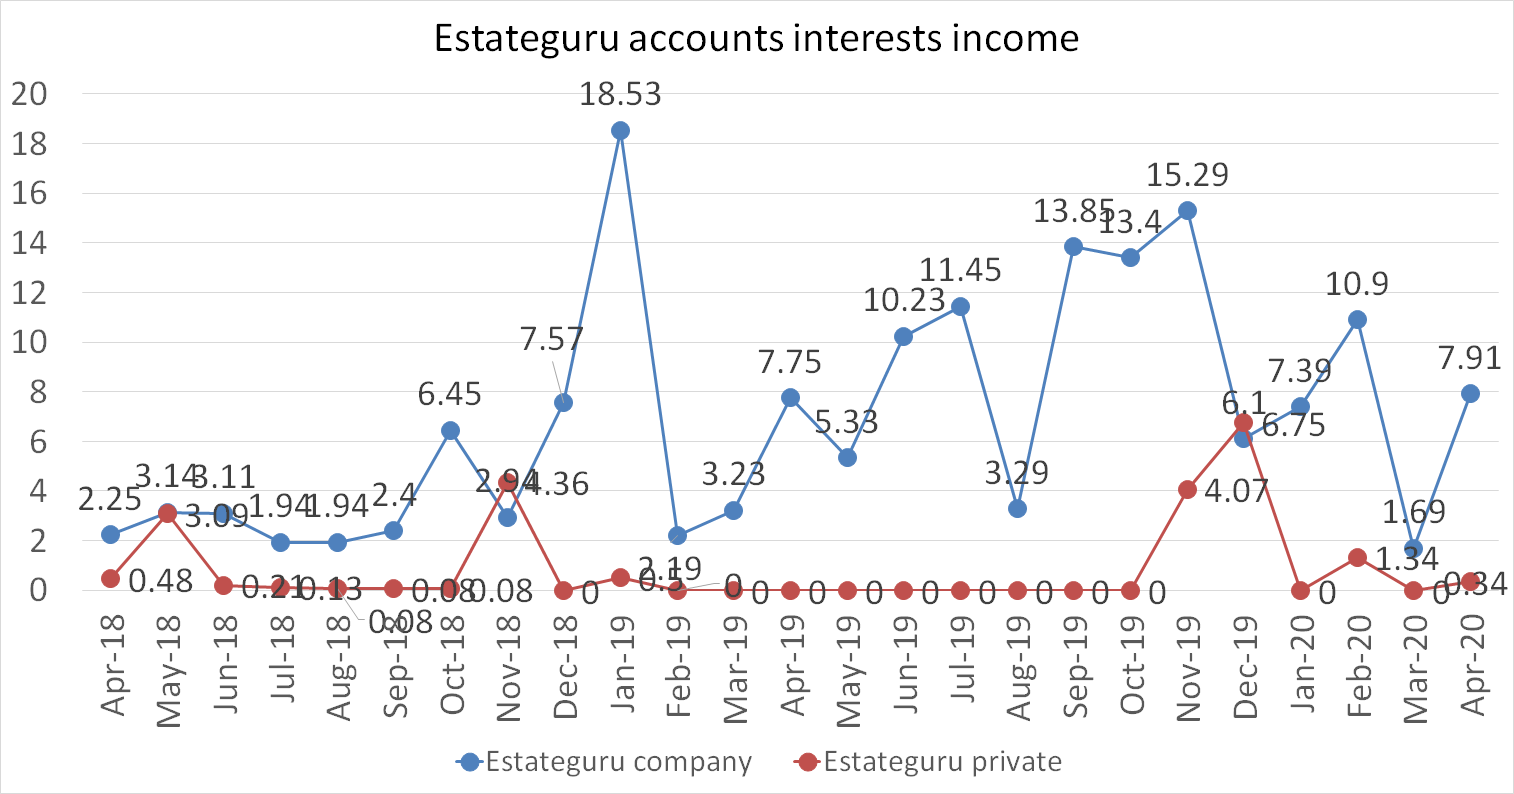 Estateguru accounts interests income in april 2020